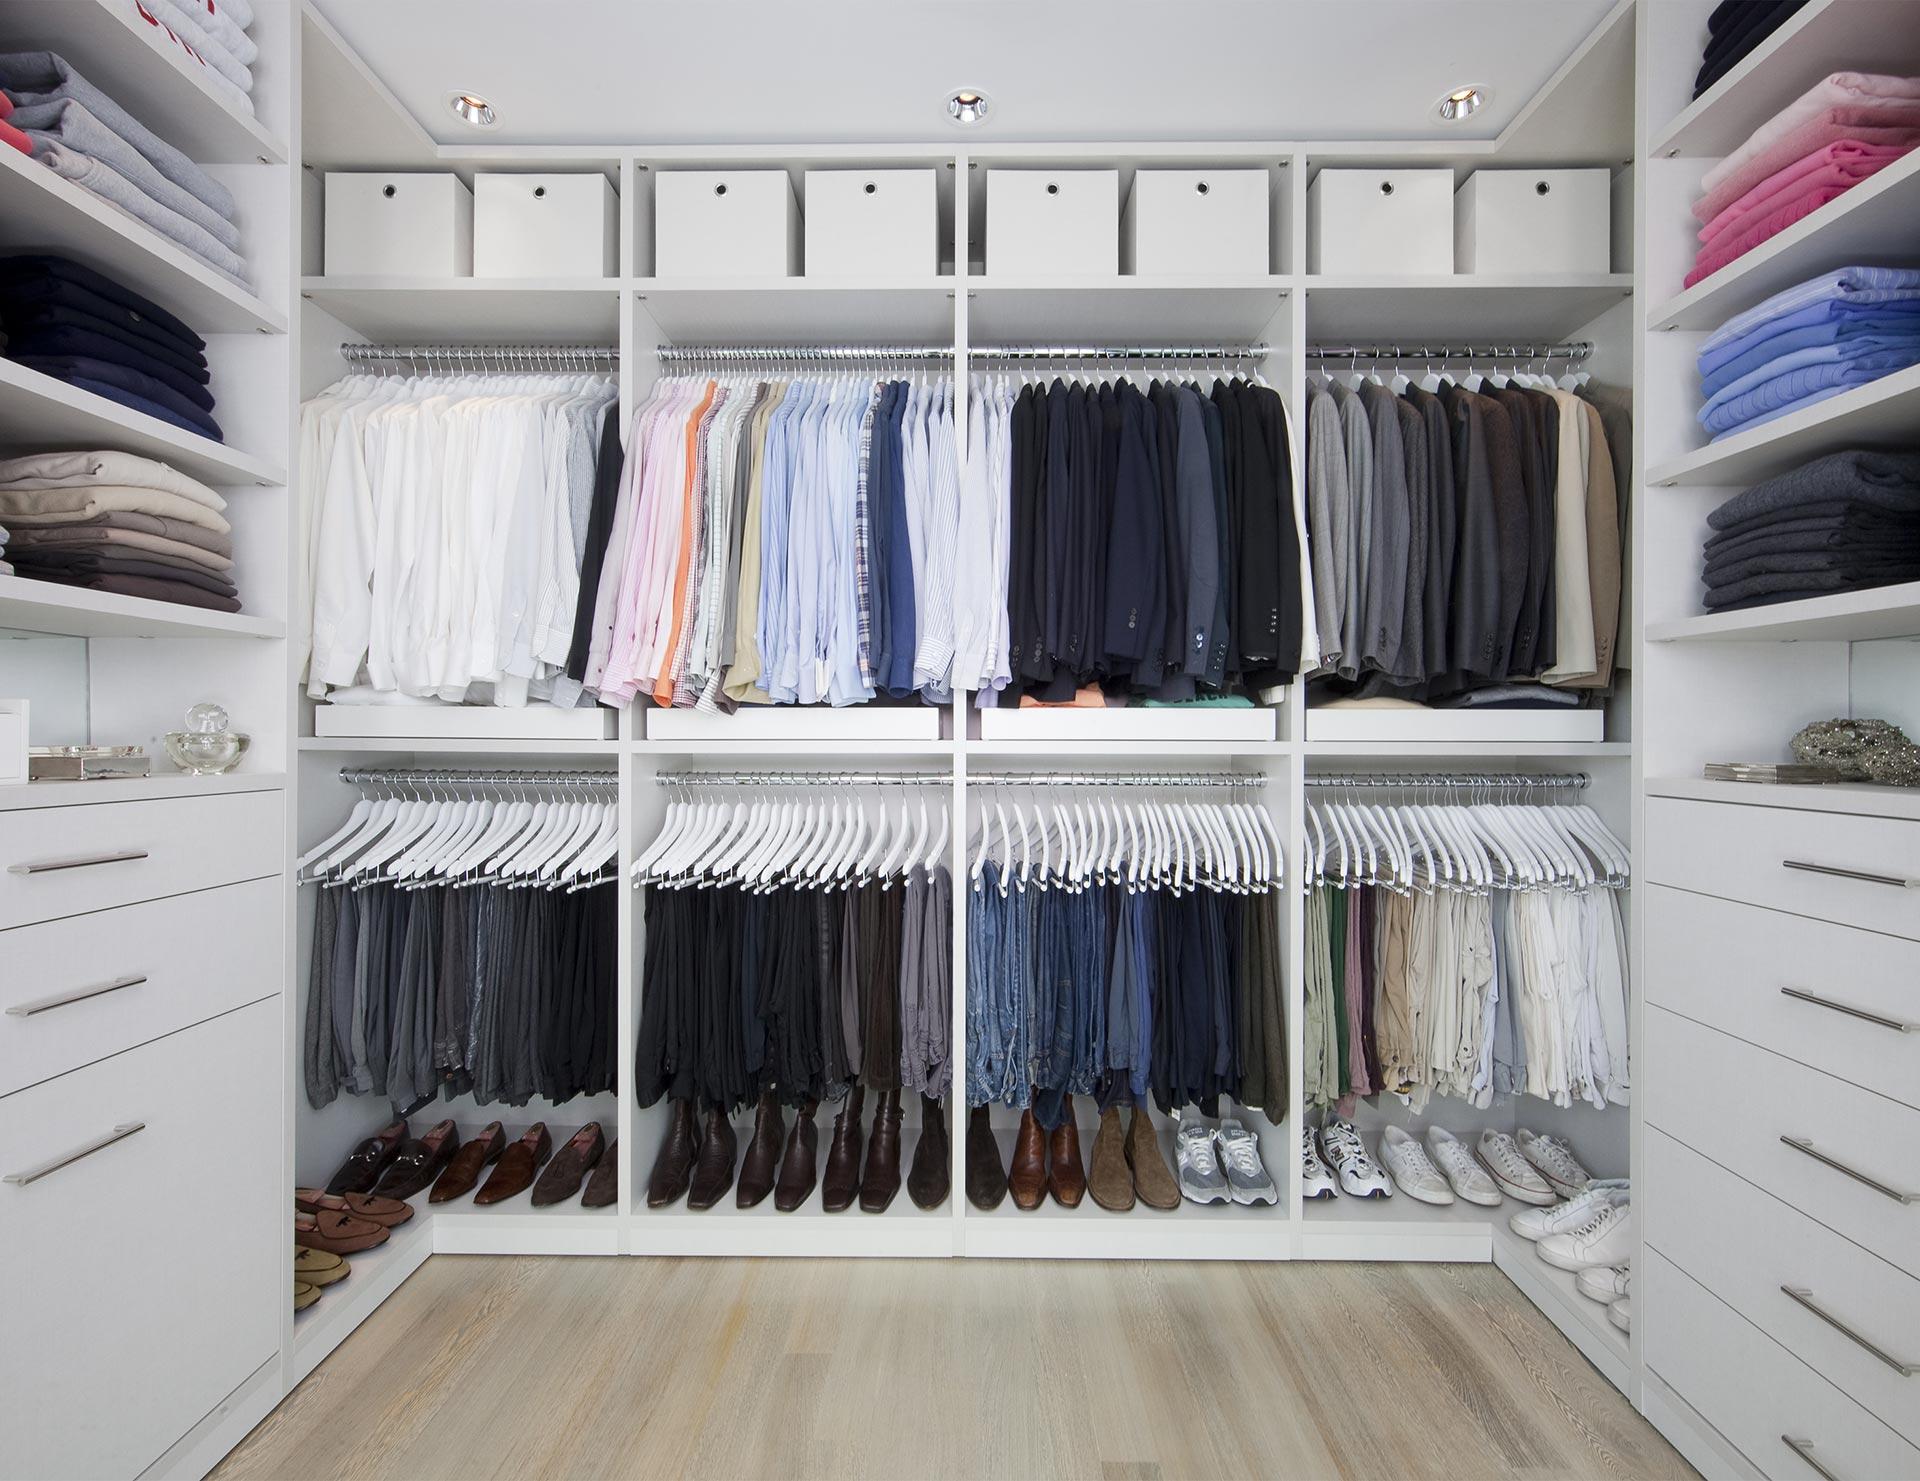 Walk in closet systems walk in closet design ideas - Walk in closet design ideas ...